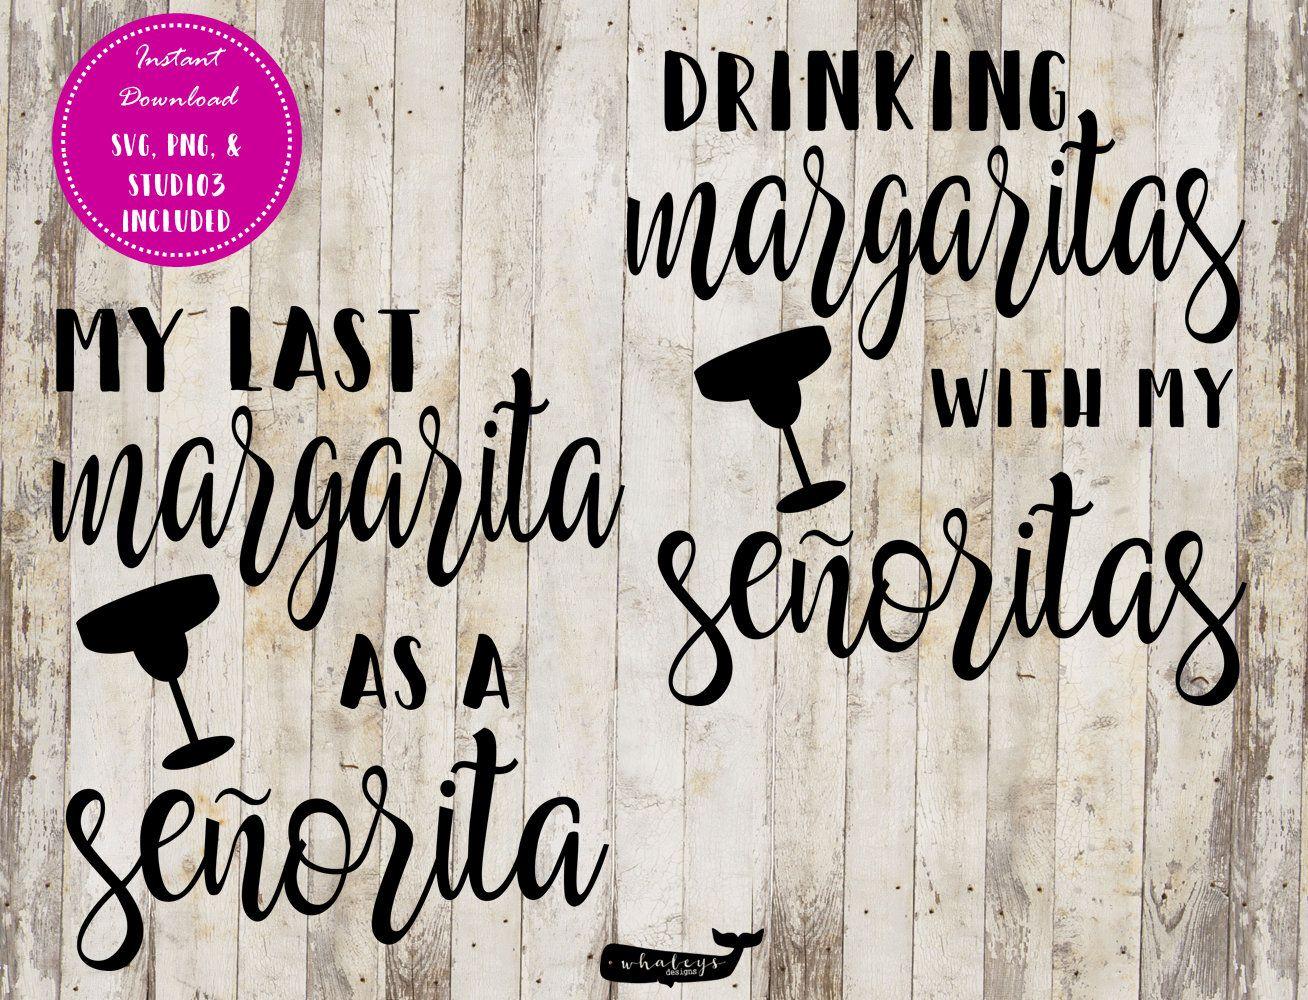 My Last Margarita As A Senorita Drinking Margaritas With My Clip Art Bachelorette Margarita